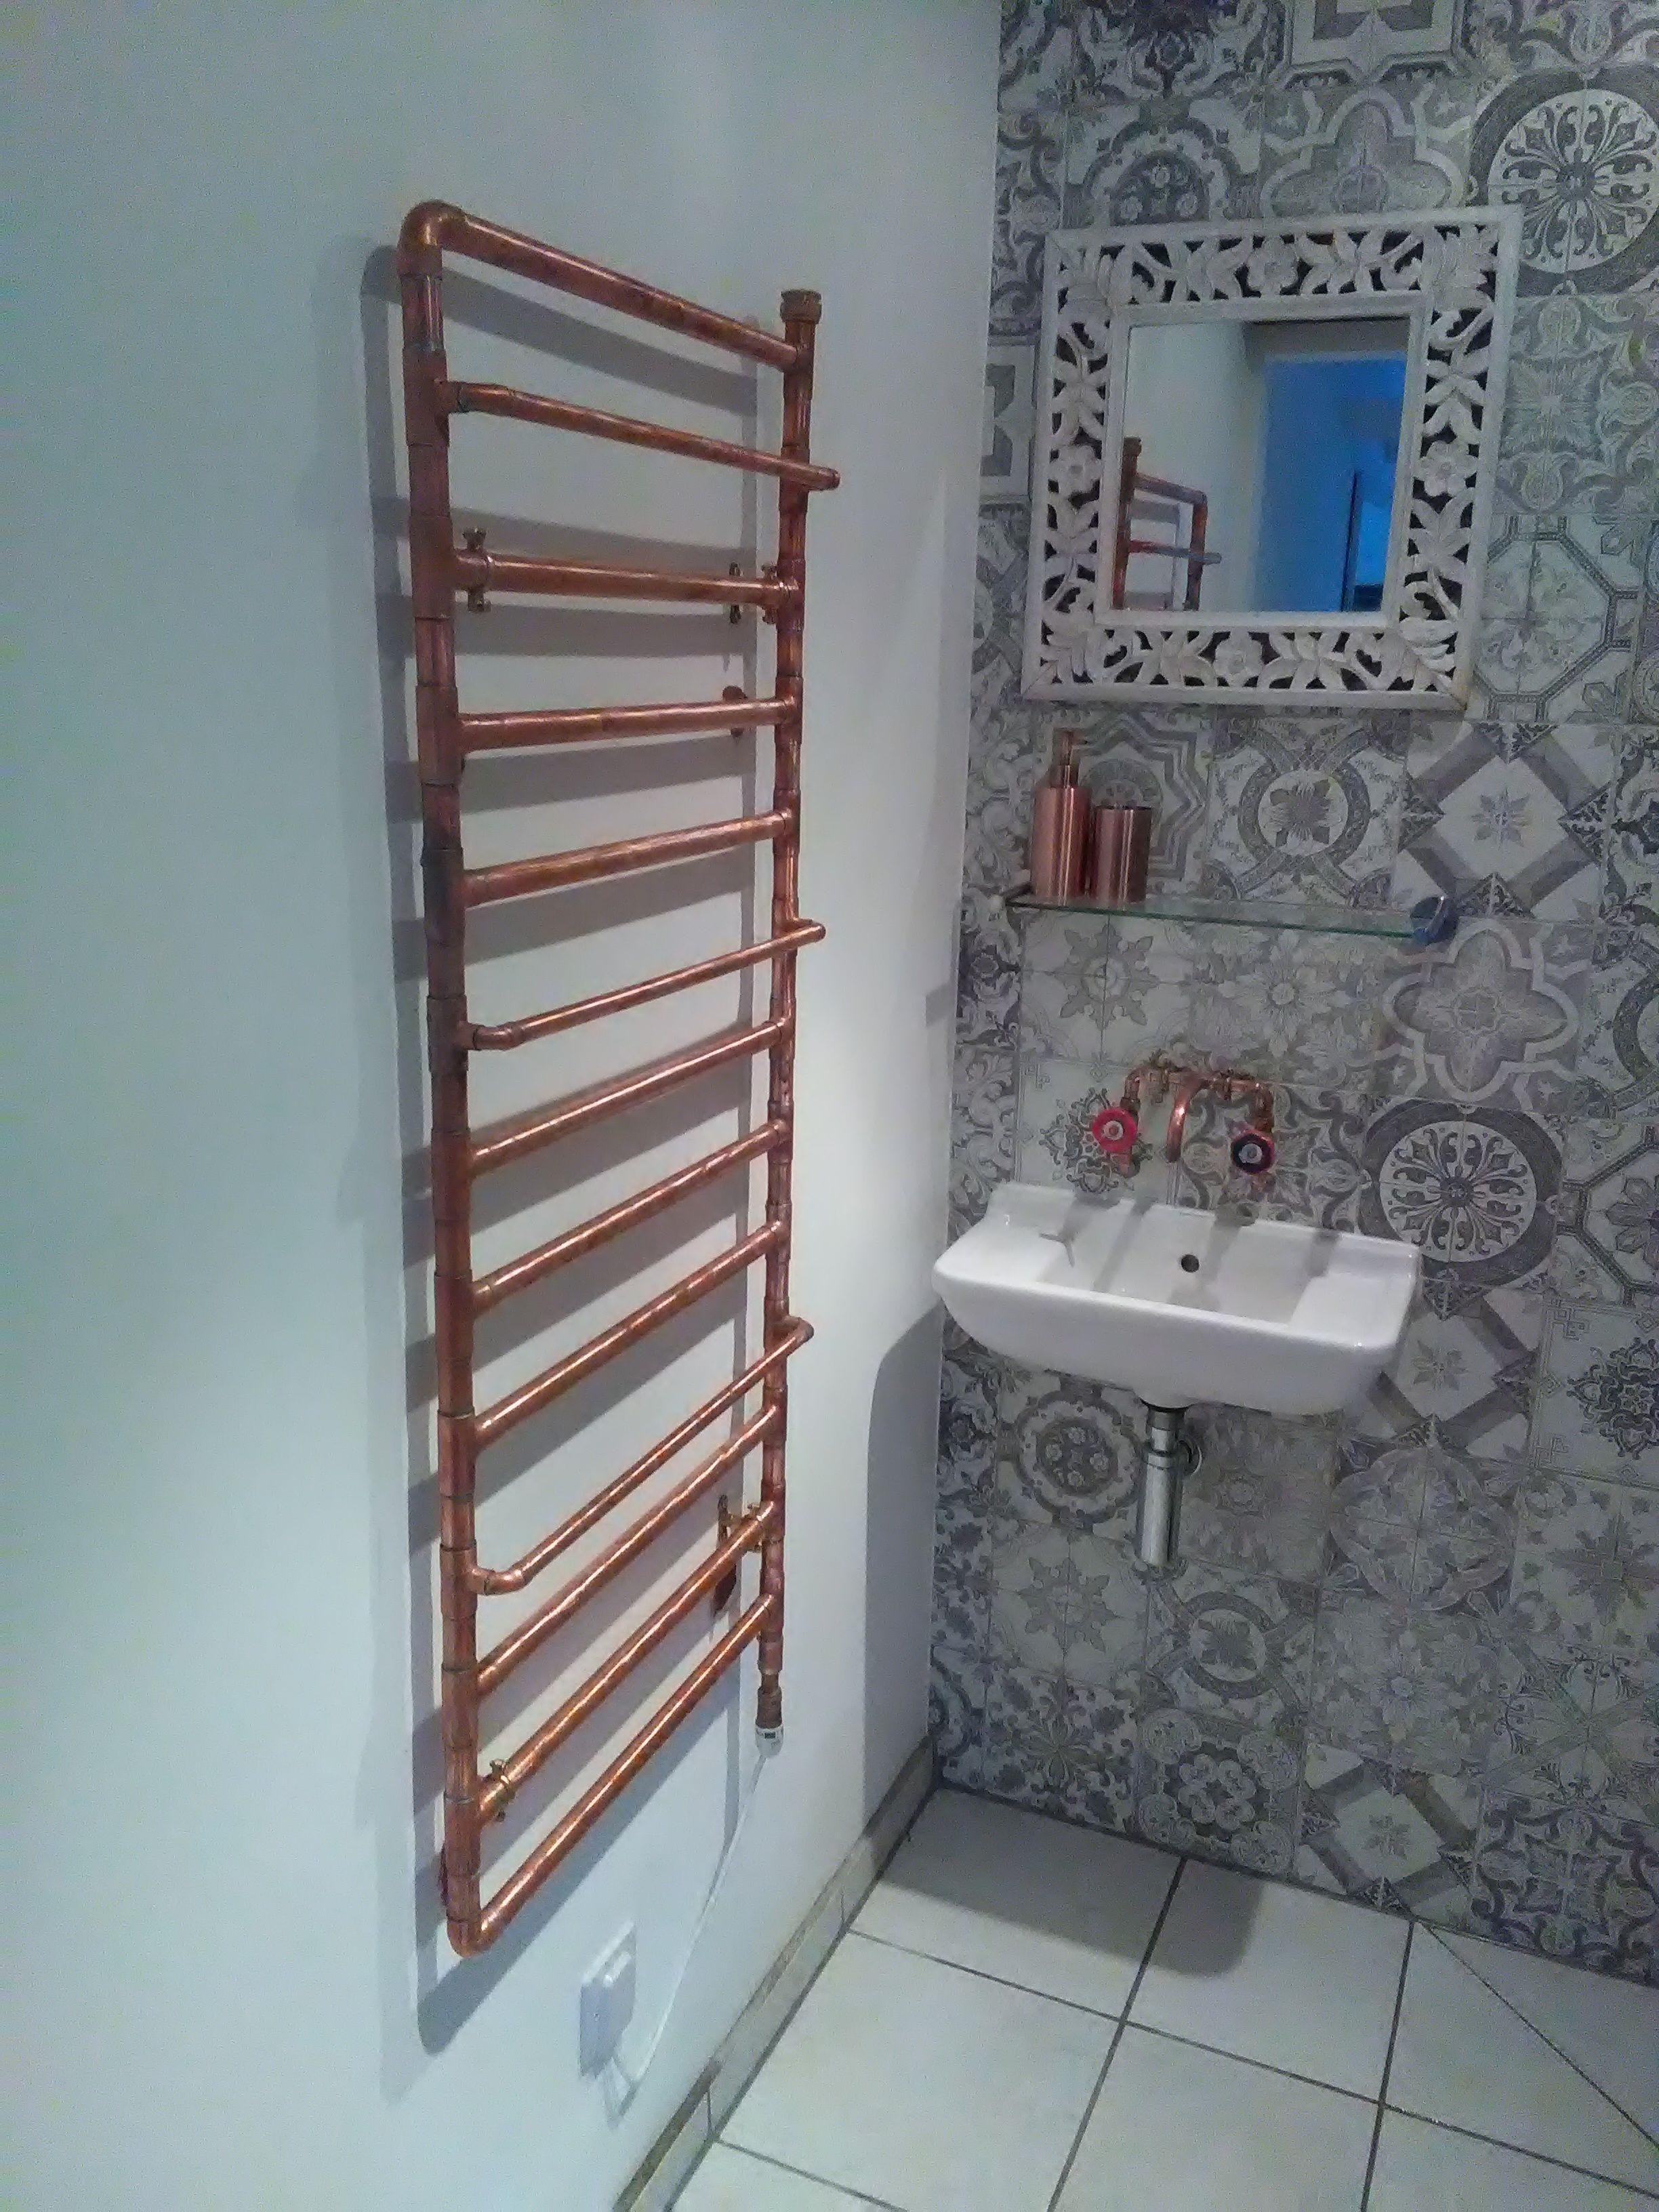 home made copper radiator calorifere pinterest radiators bath and pipe furniture. Black Bedroom Furniture Sets. Home Design Ideas